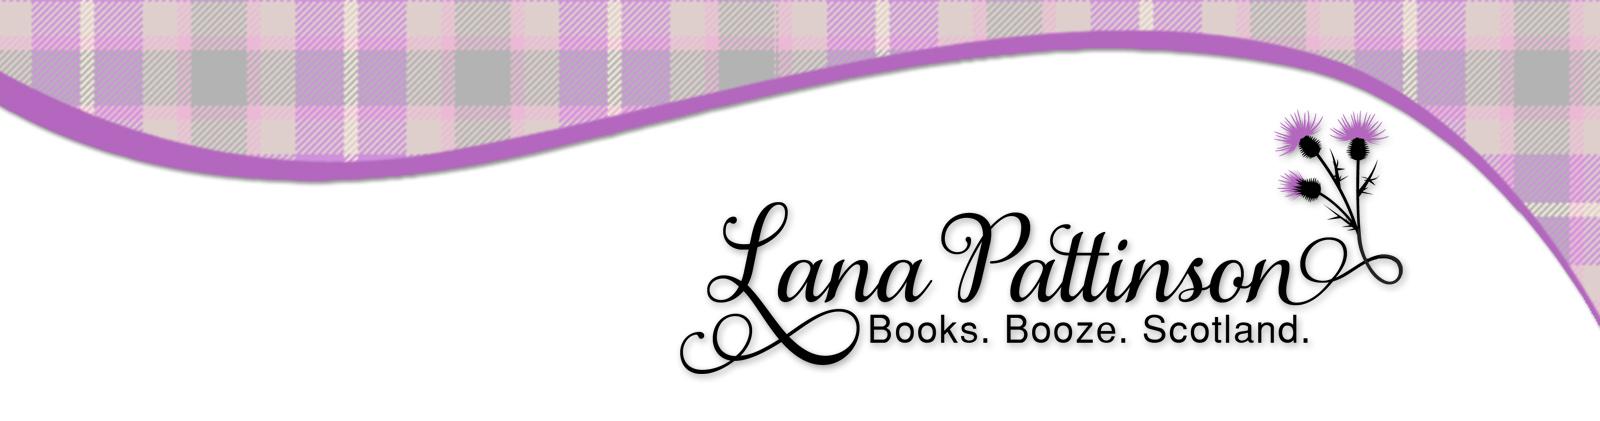 Lana Pattinson